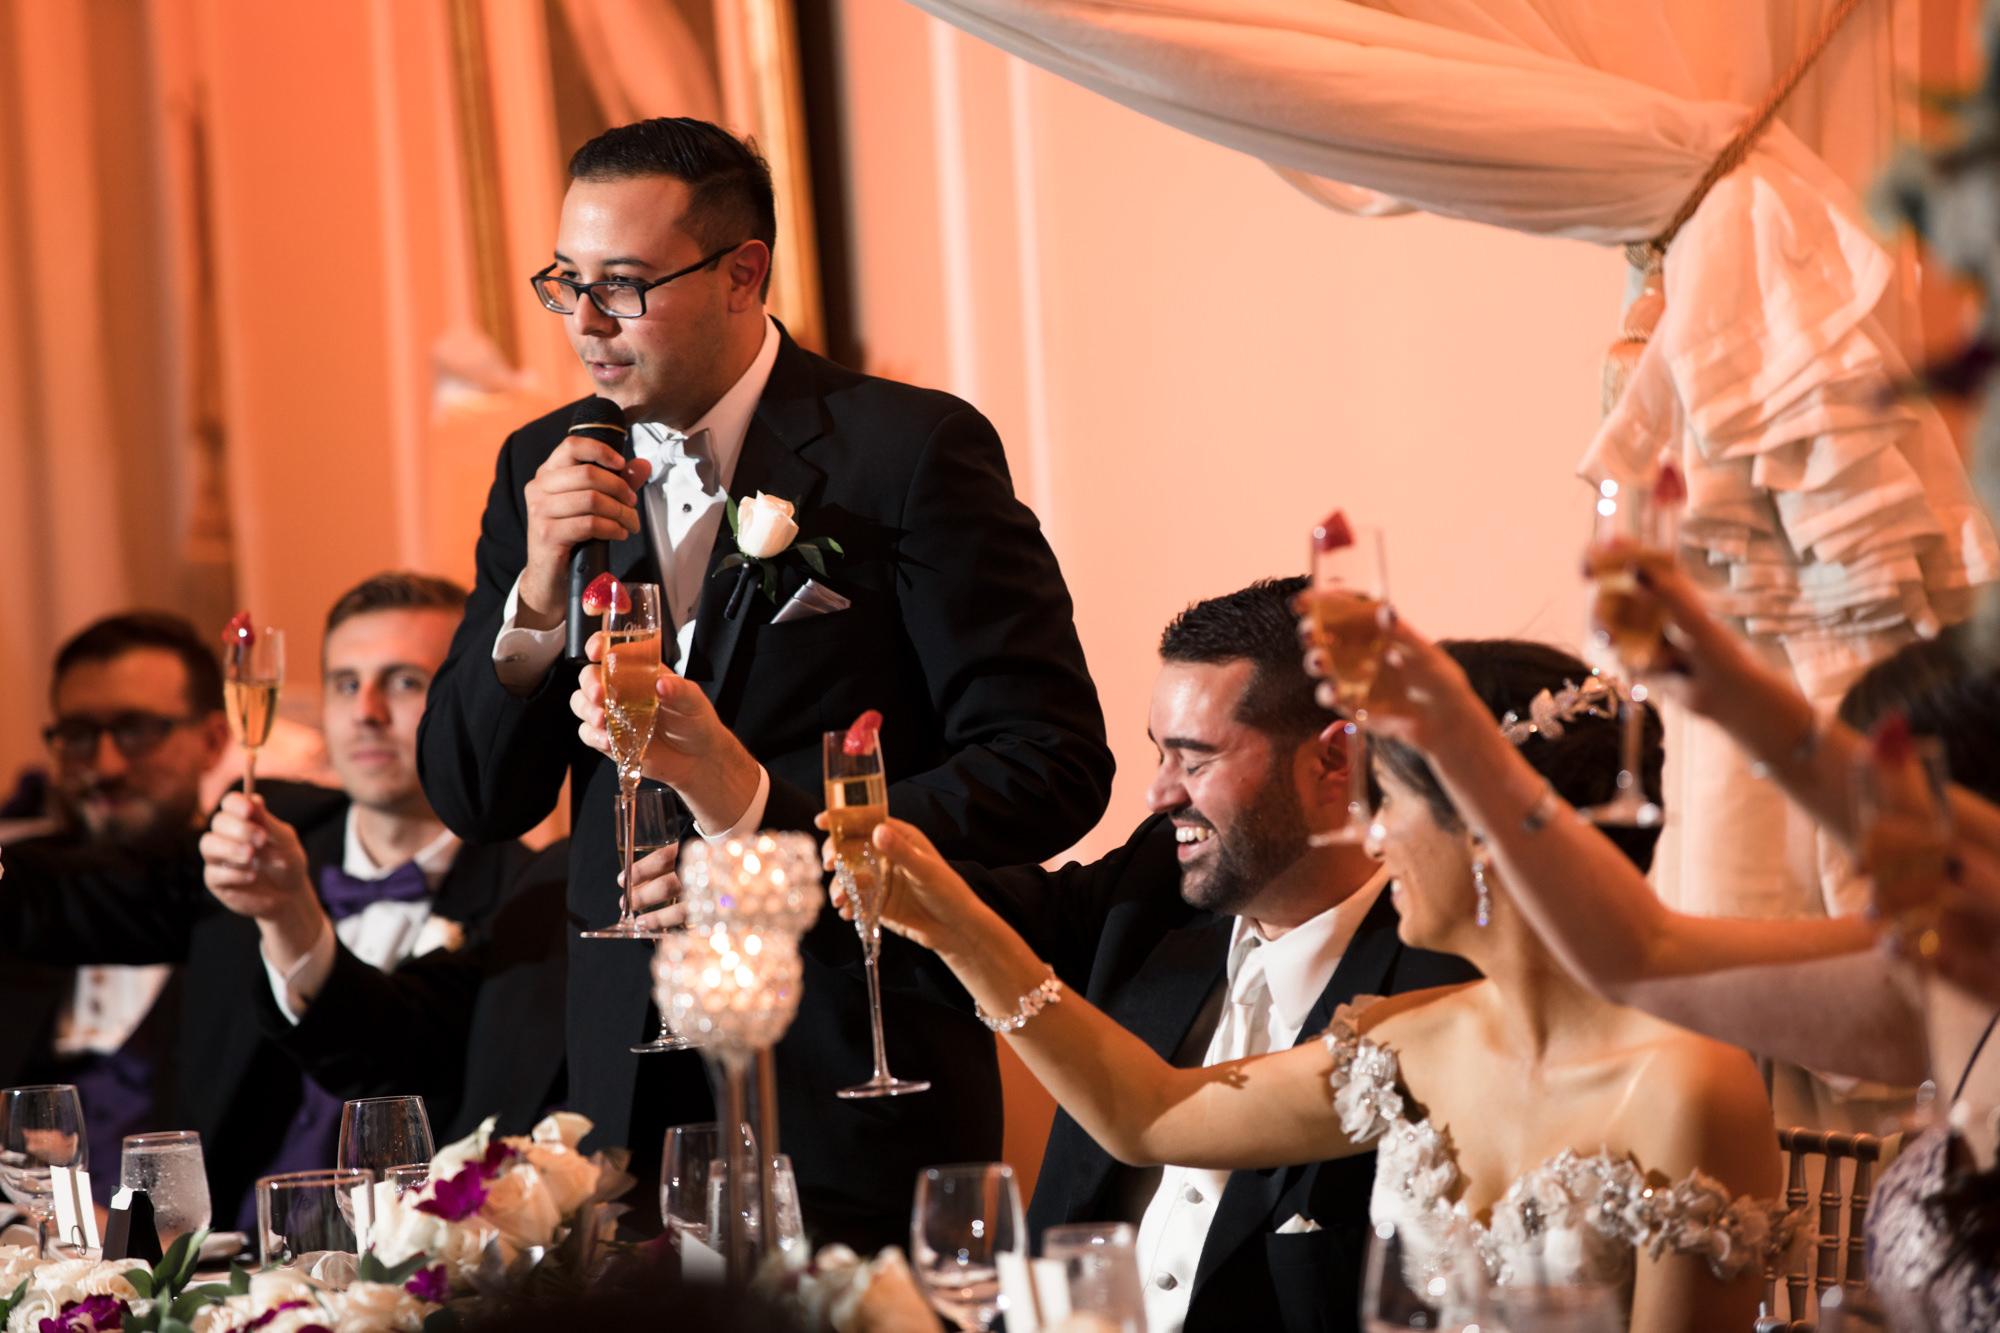 Benvenuto_Wedding_catholic_Florida_Bride-Groom-112.jpg